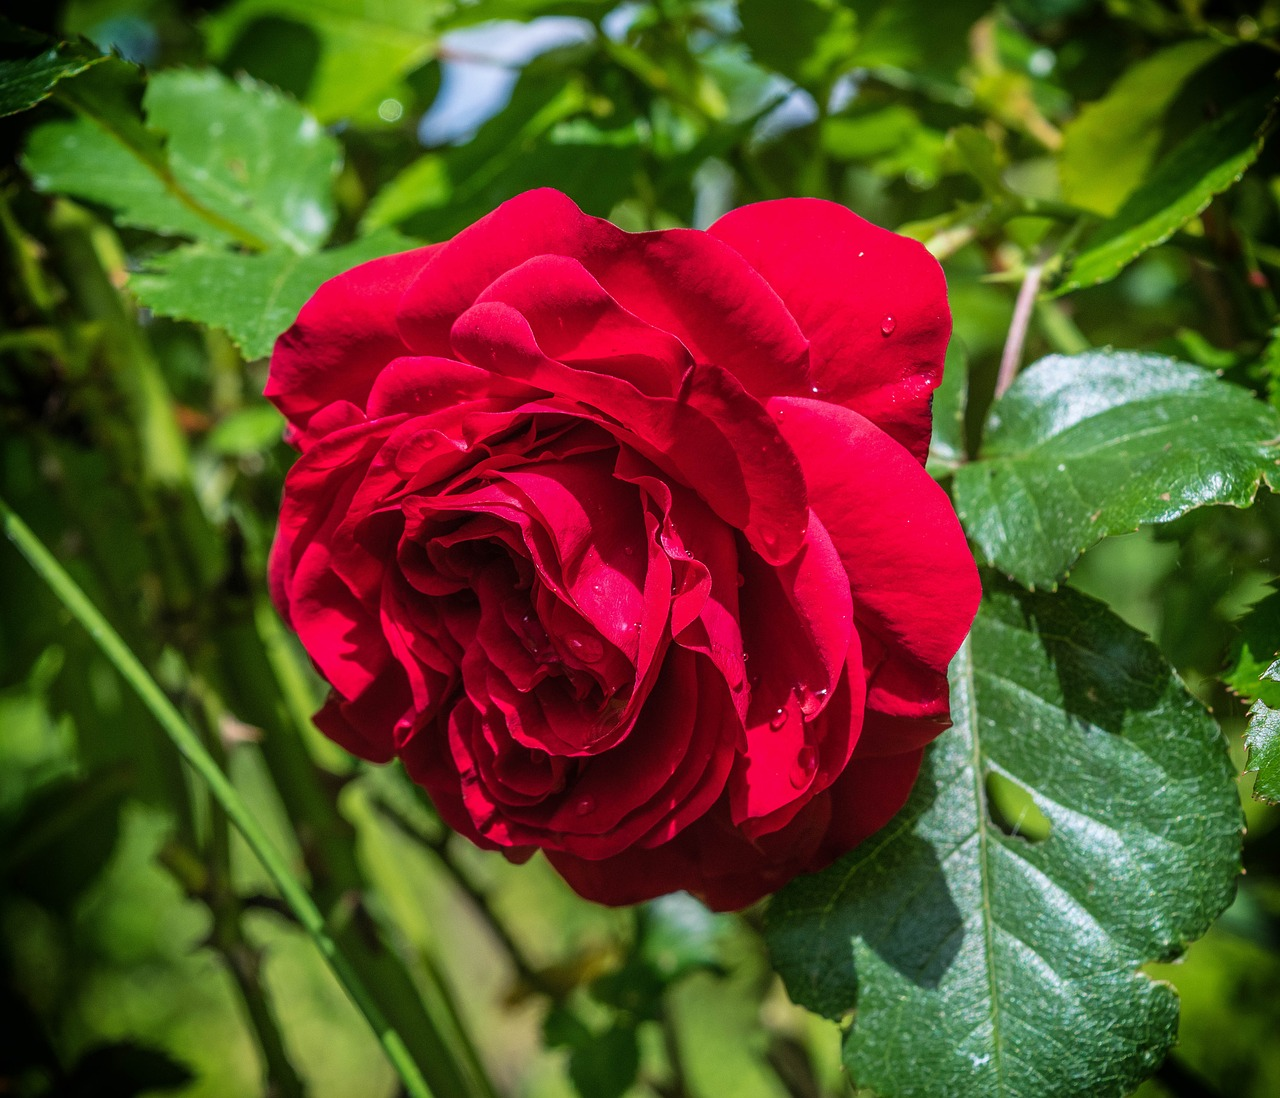 Roseredloverose bloomromance free photo from needpix roseredloverose bloomromancefragrancebeautybeautiful izmirmasajfo